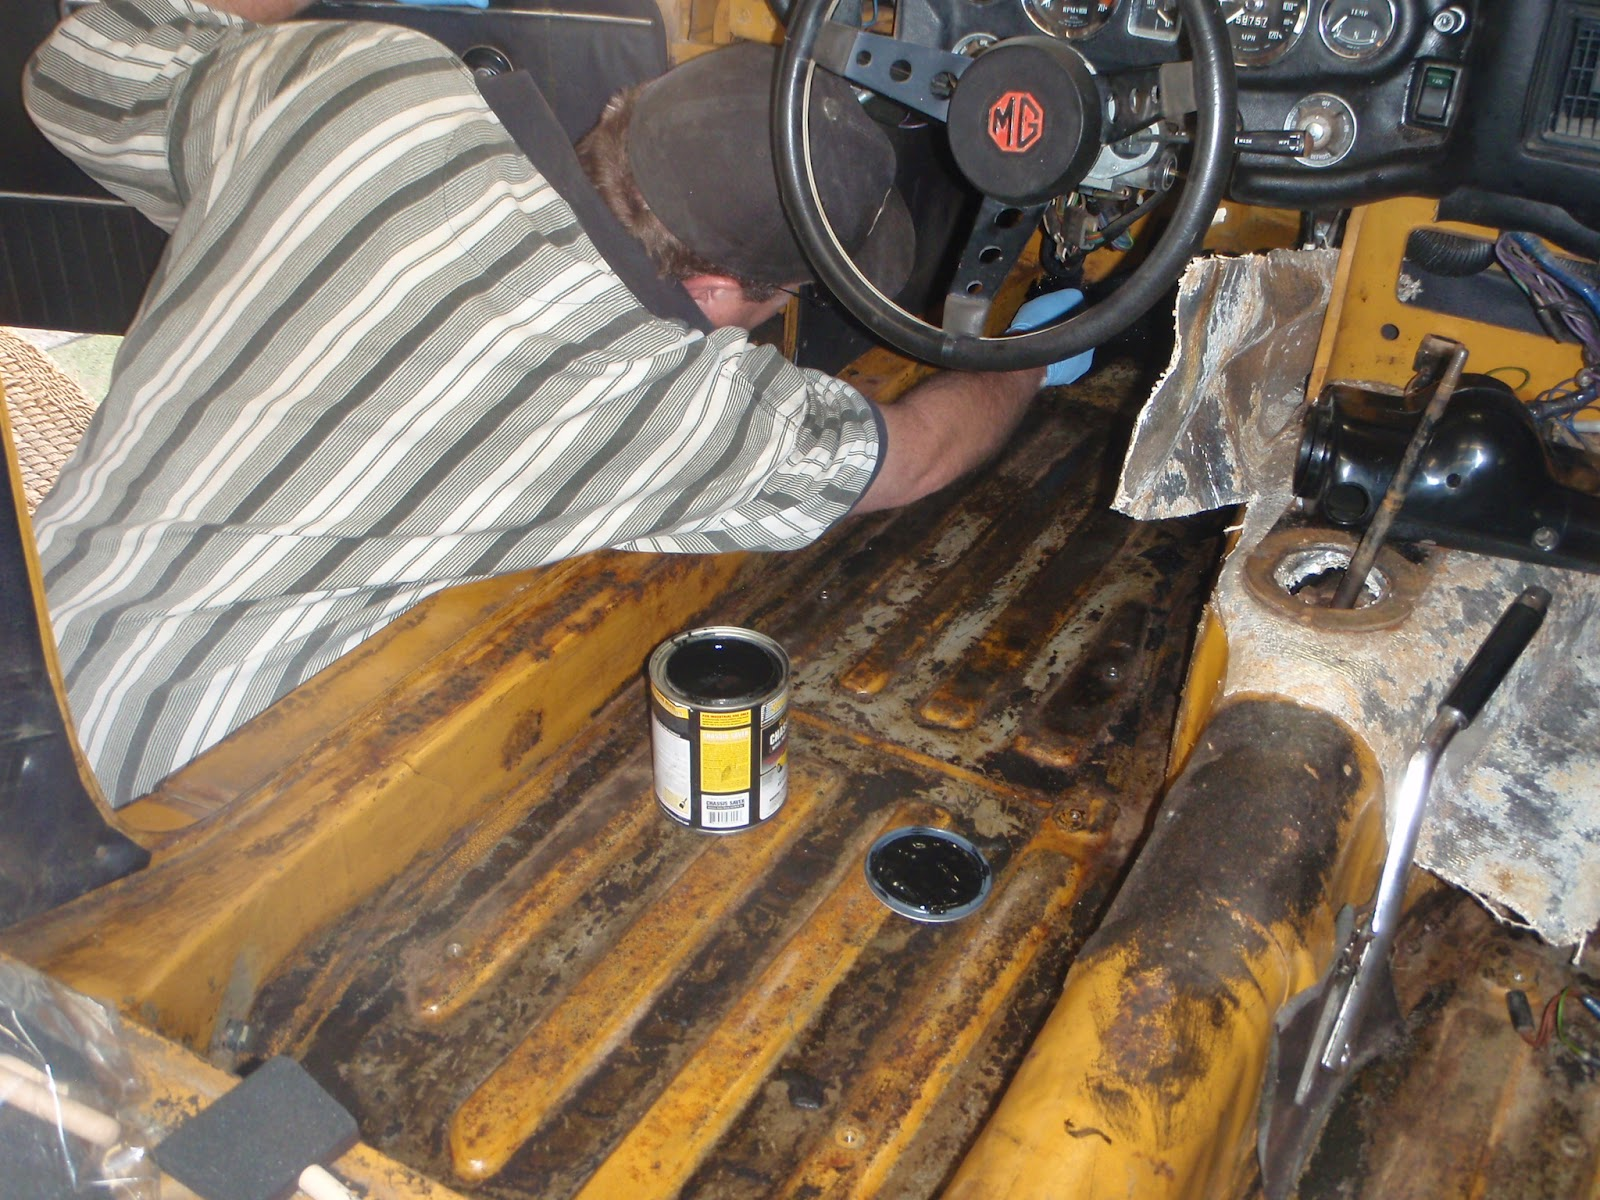 MGB in the Garage: Floor paint, carpets, lenses, etc